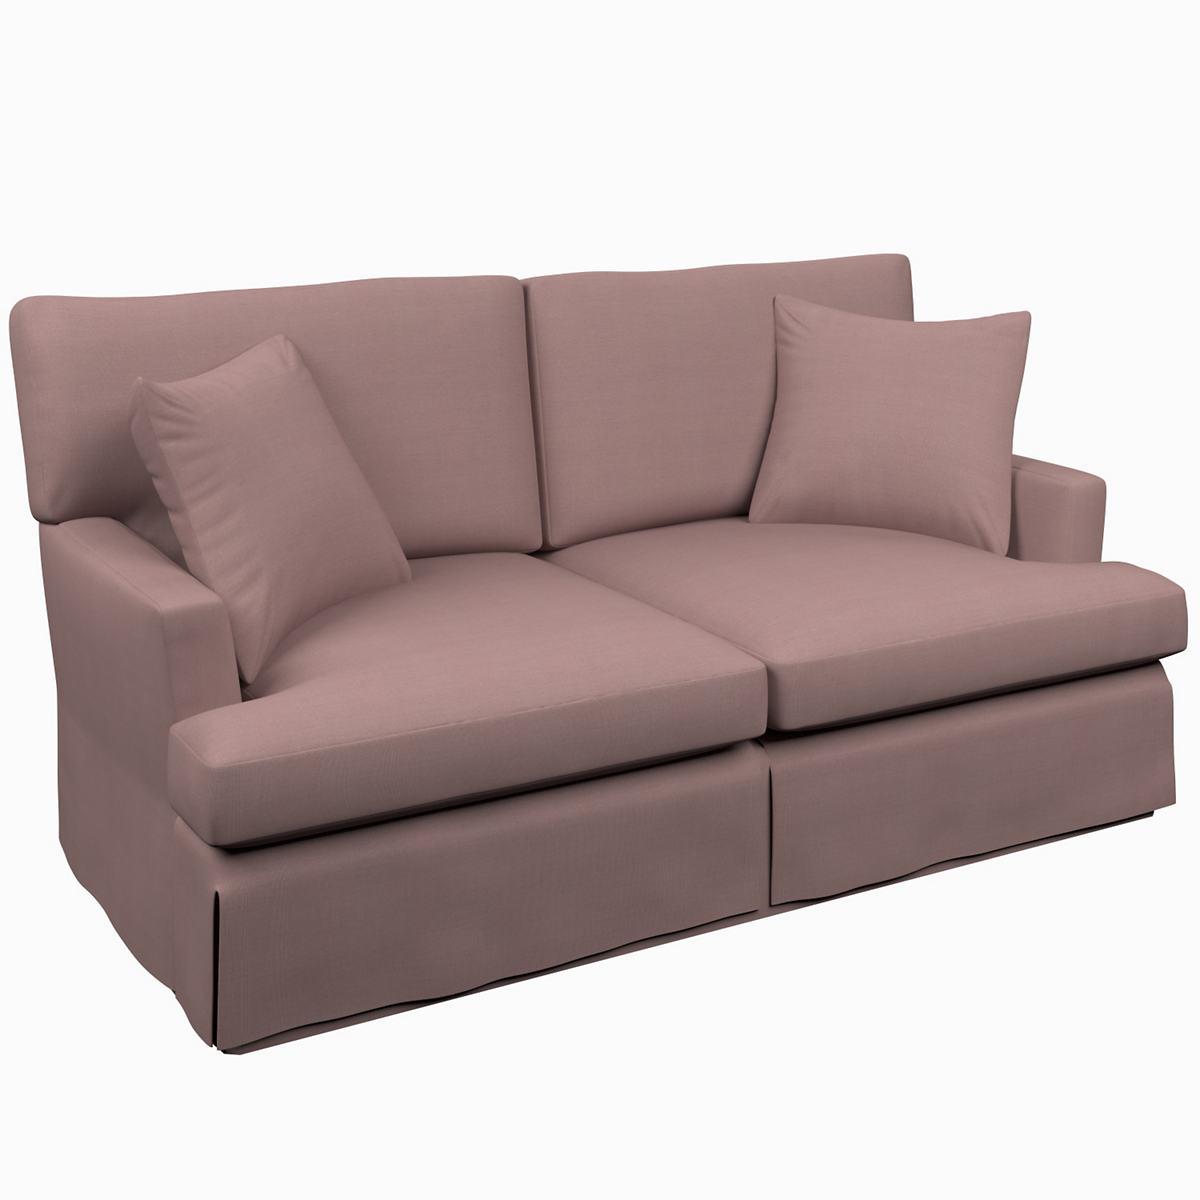 Estate Linen Zinc Saybrook 2 Seater Upholstered Sofa